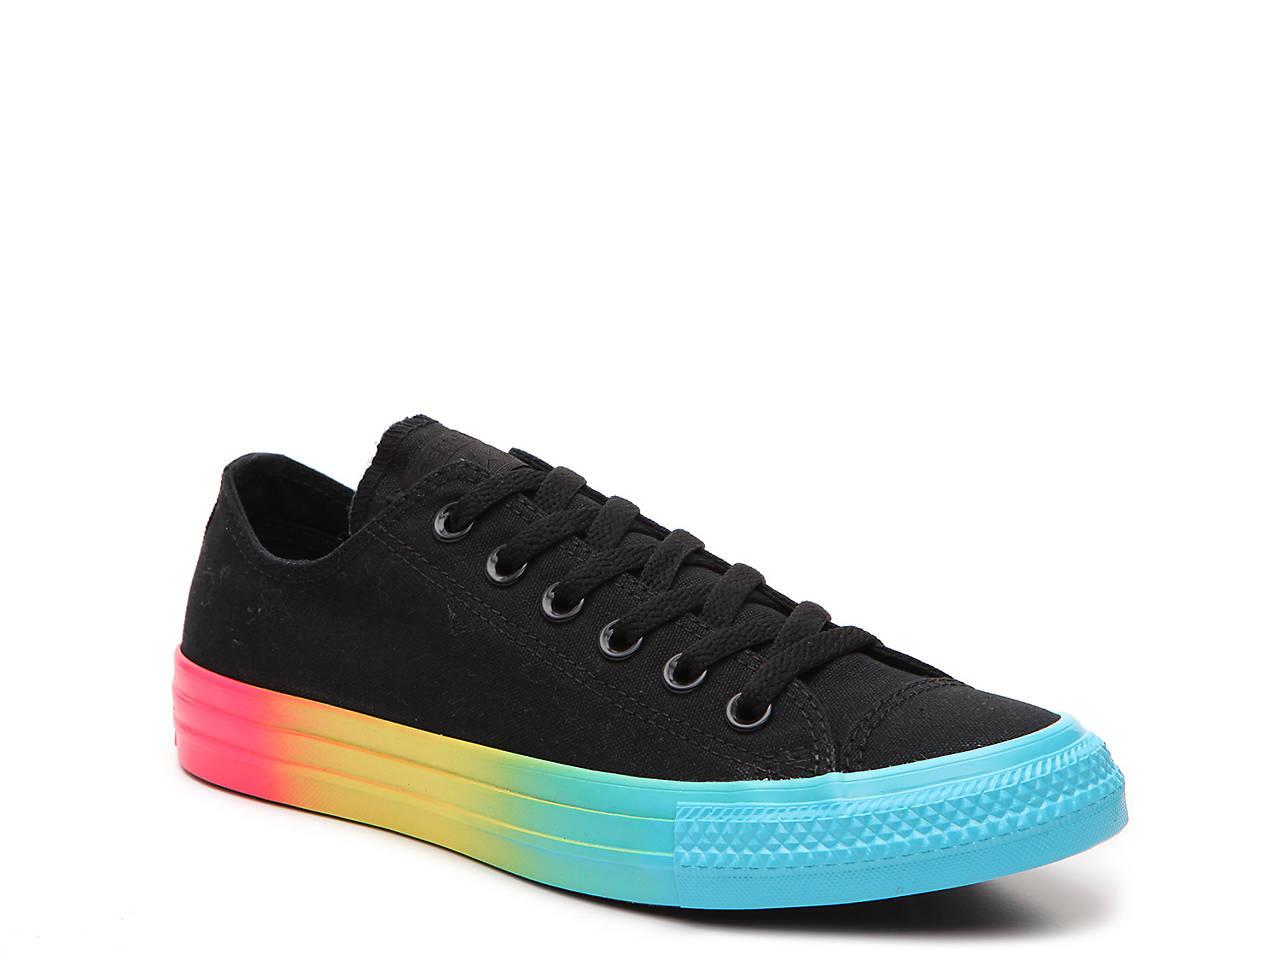 2converse rainbow